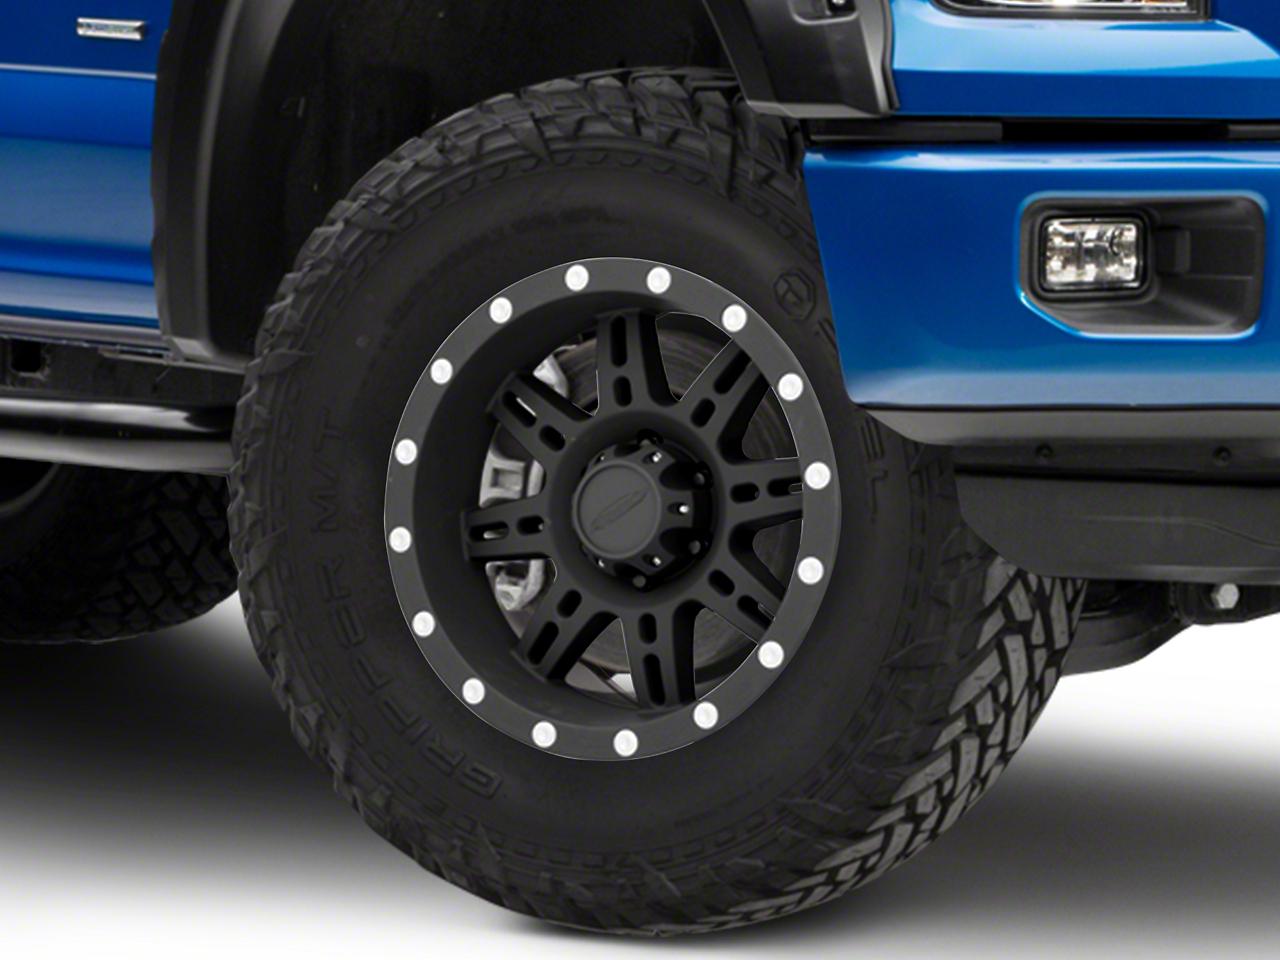 Pro Comp Series 7031 Matte Black 6-Lug Wheel - 18x9 (04-18 F-150)